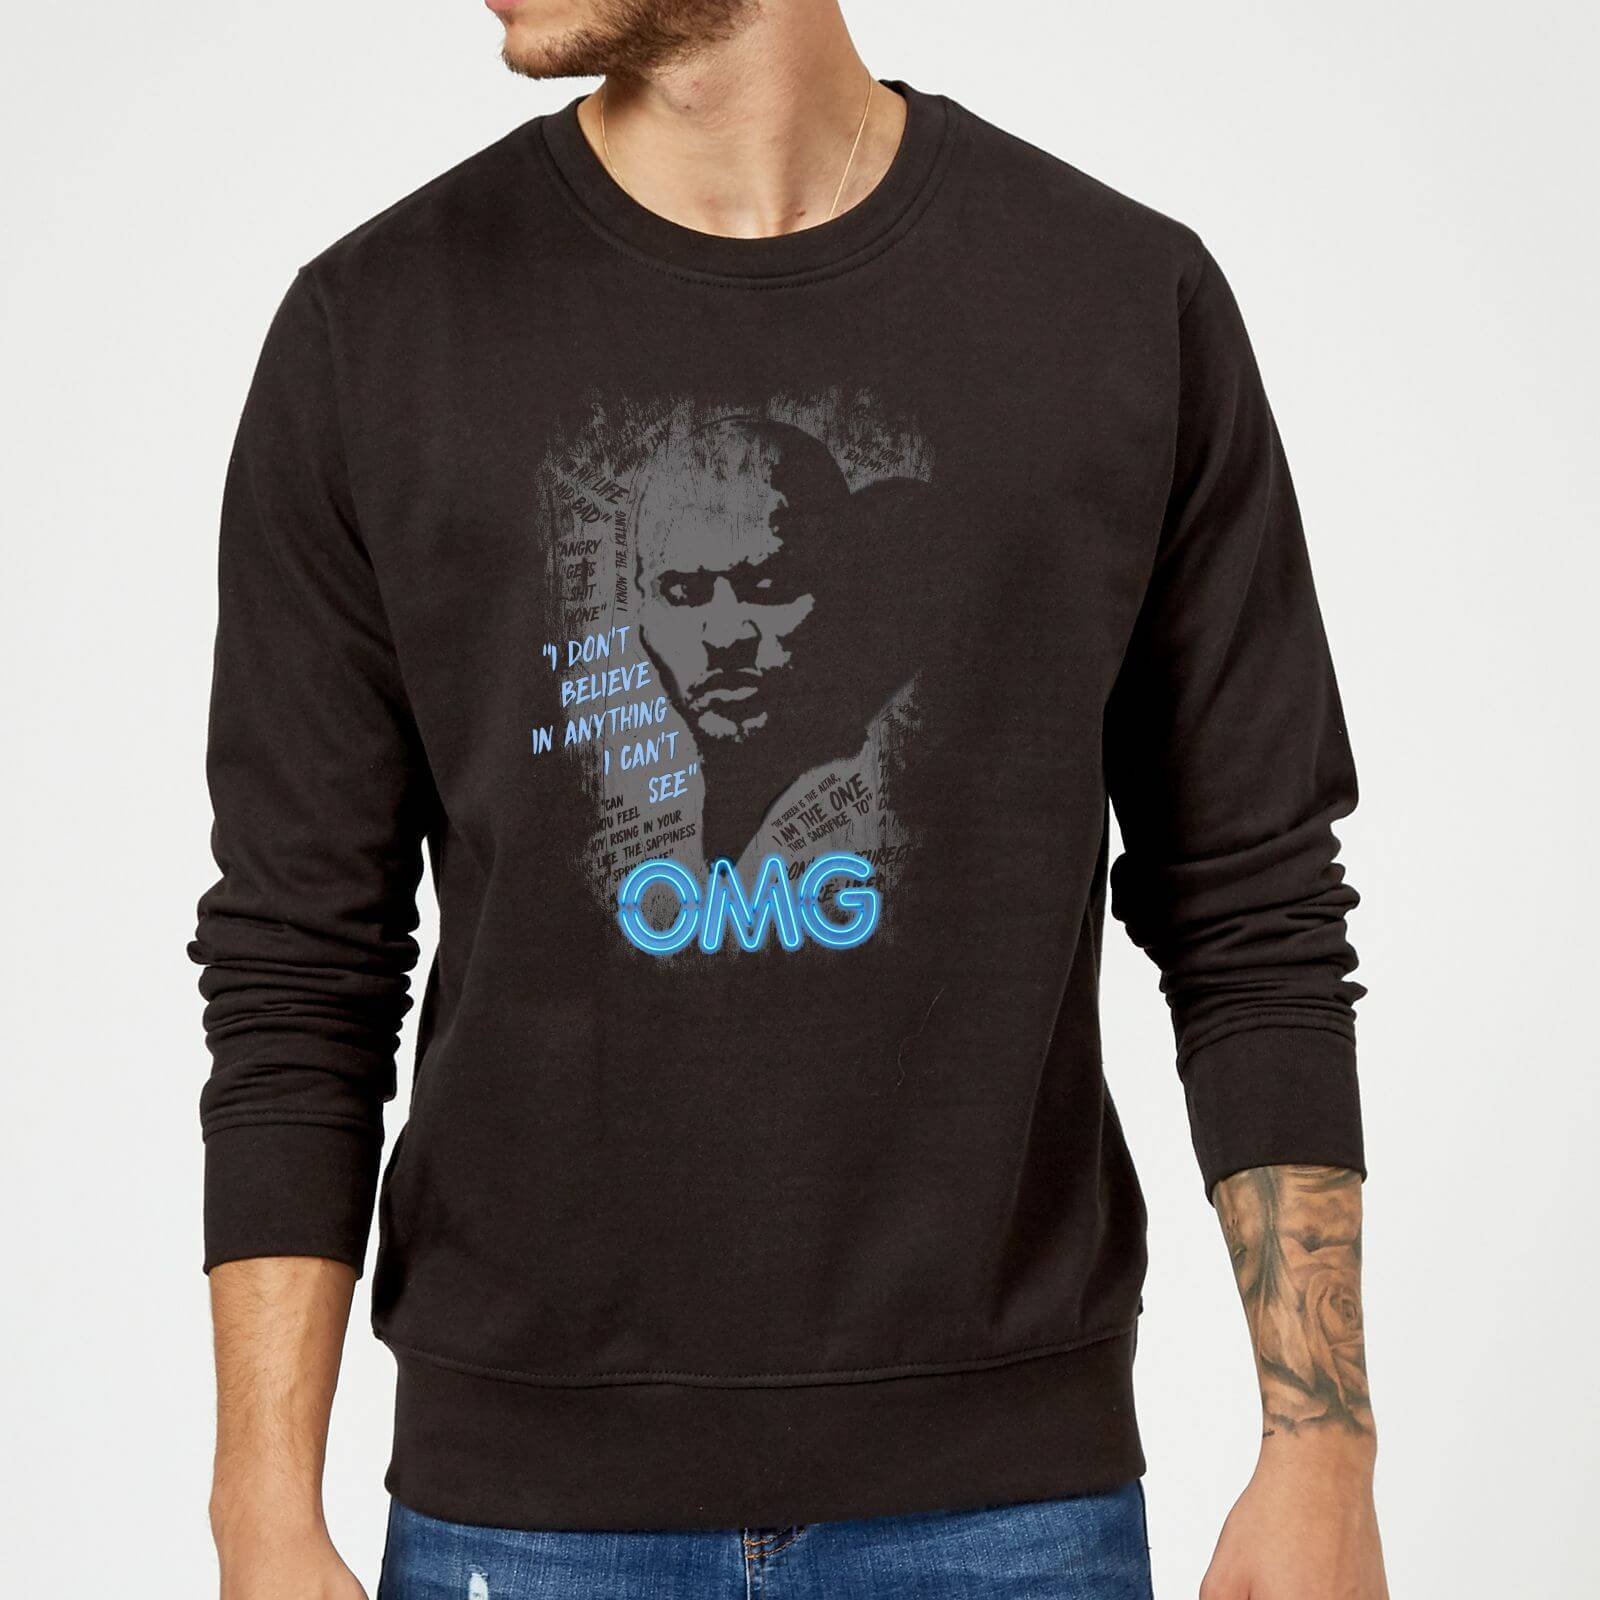 American Gods Shadow OMG Sweatshirt - Black - M - Black-male